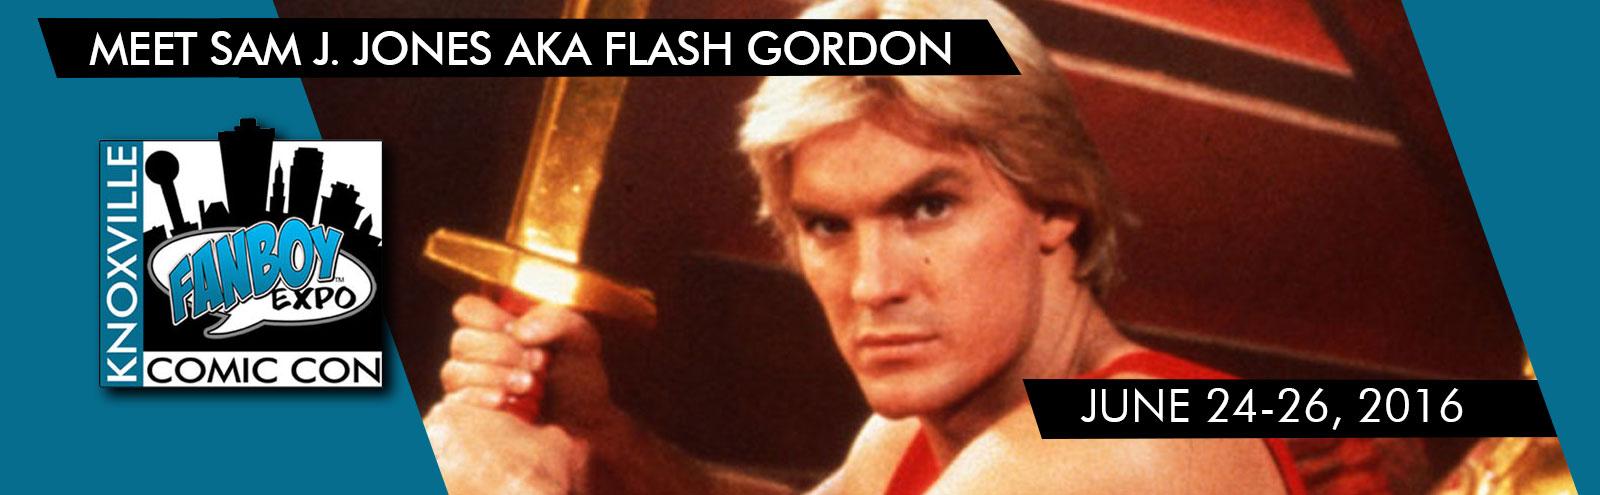 featuredflash-gordon